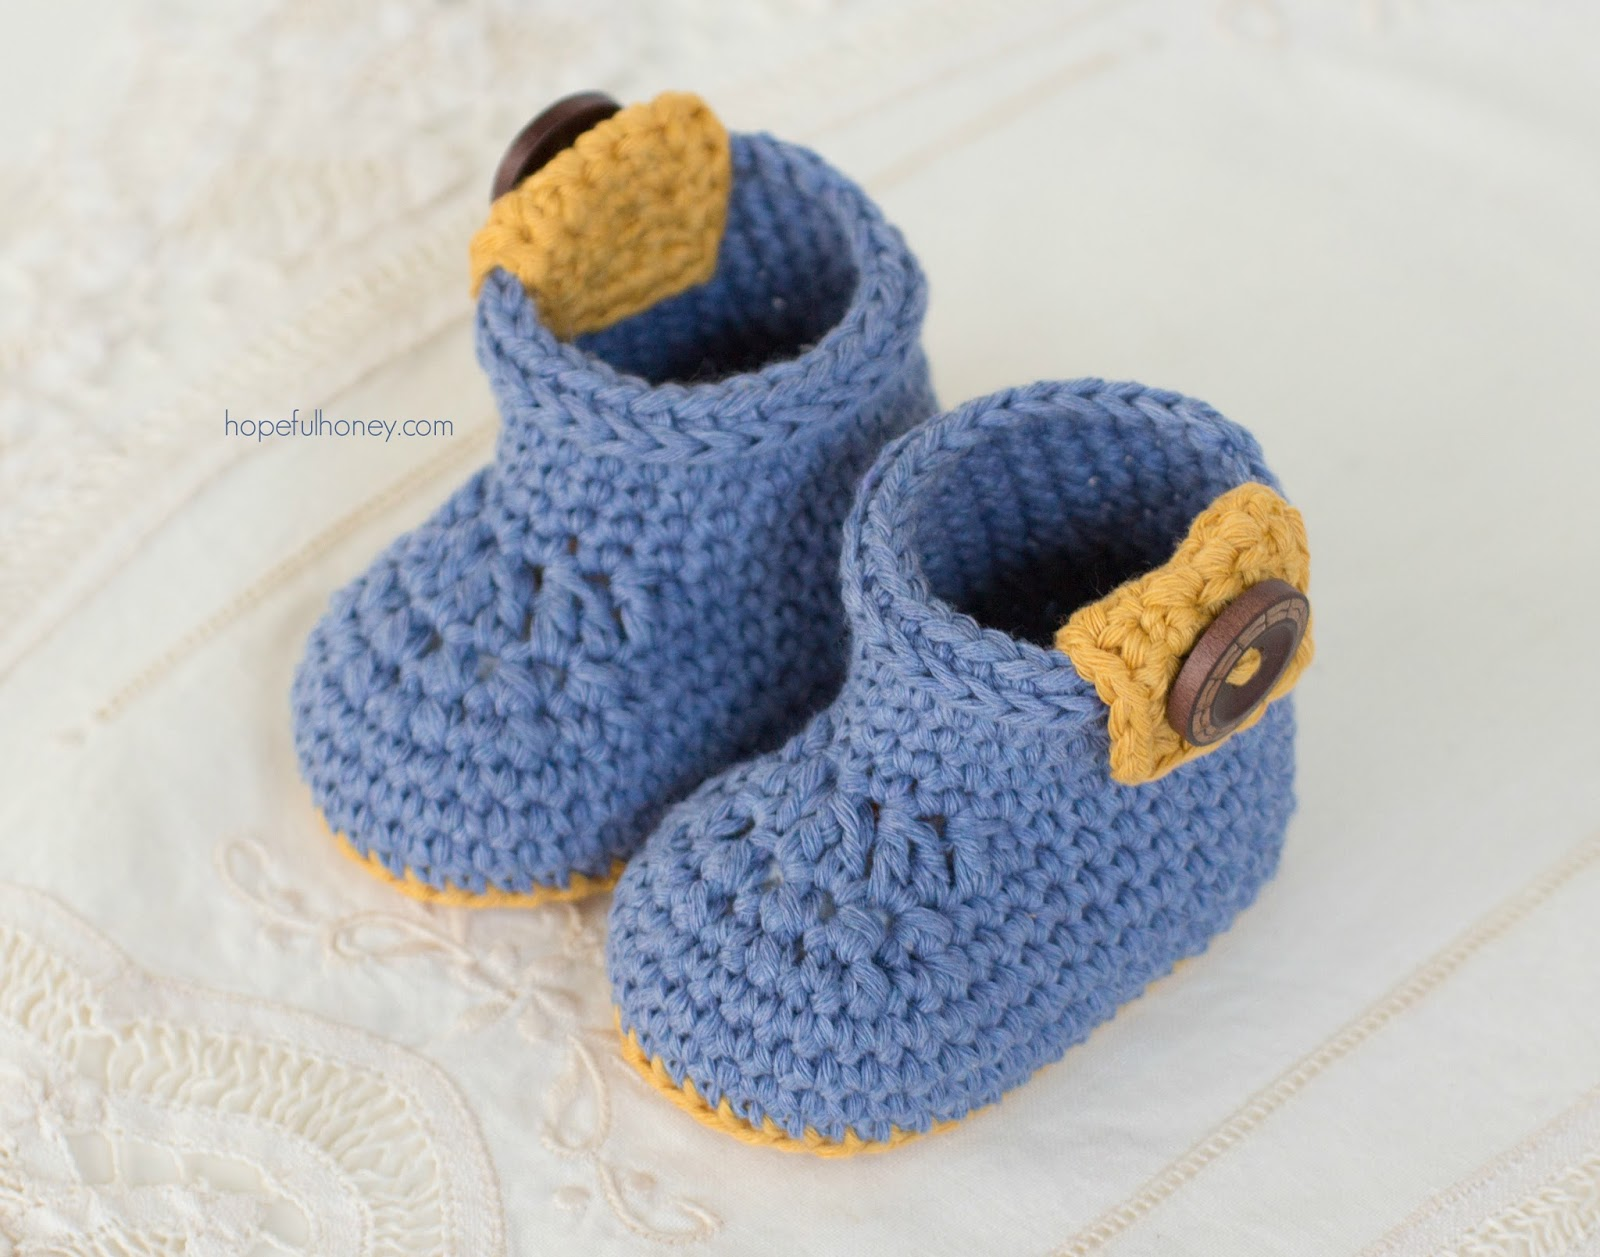 Crochet Baby Ankle Booties Free Pattern : Hopeful Honey Craft, Crochet, Create: Urban Baby Ankle ...